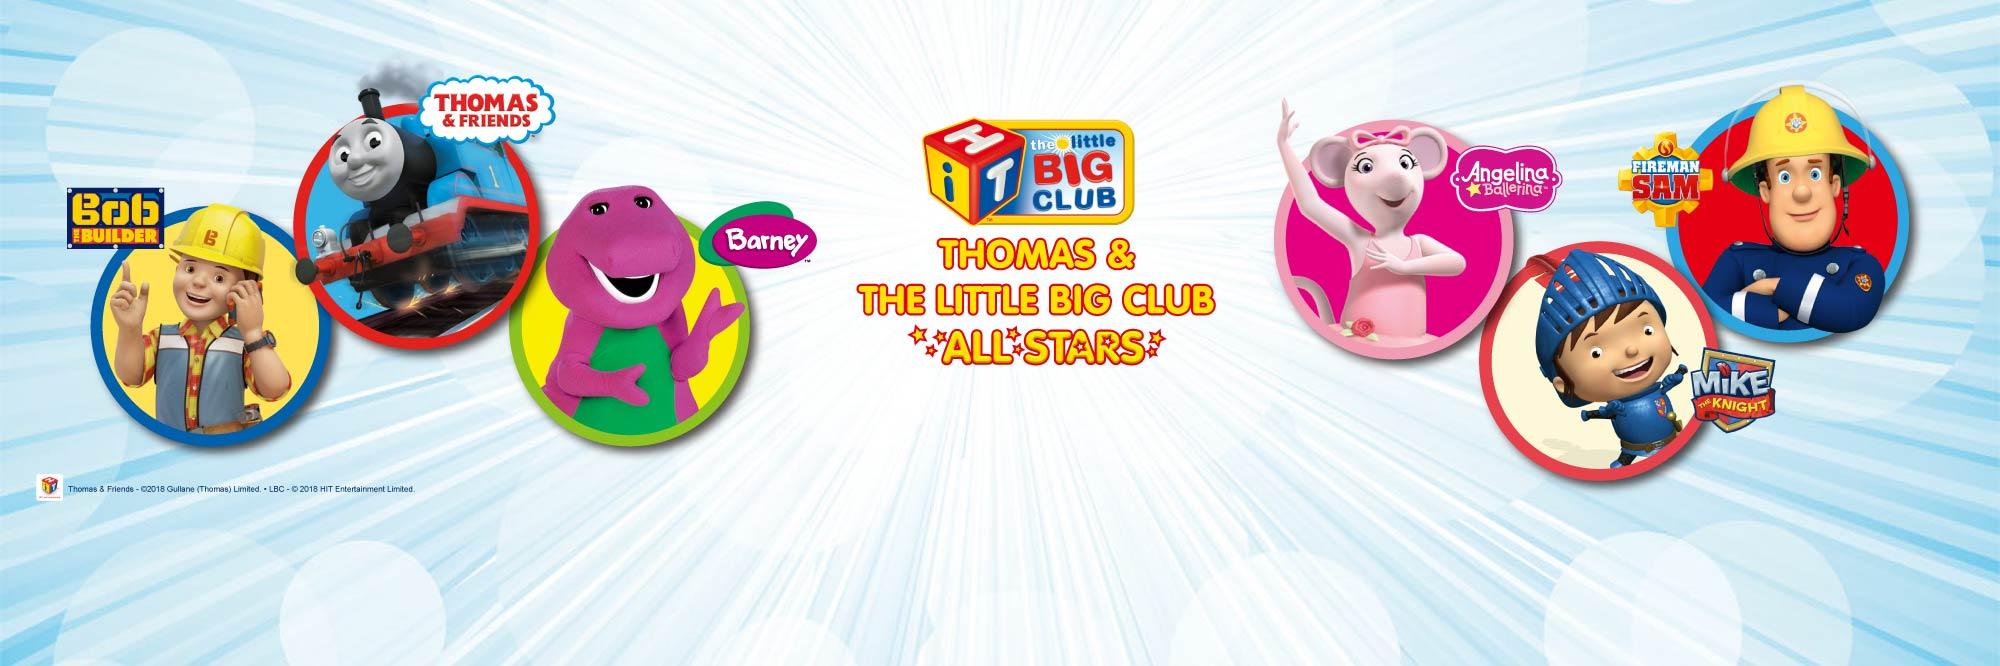 THE LITTLE BIG CLUB ALL STARS LIVE